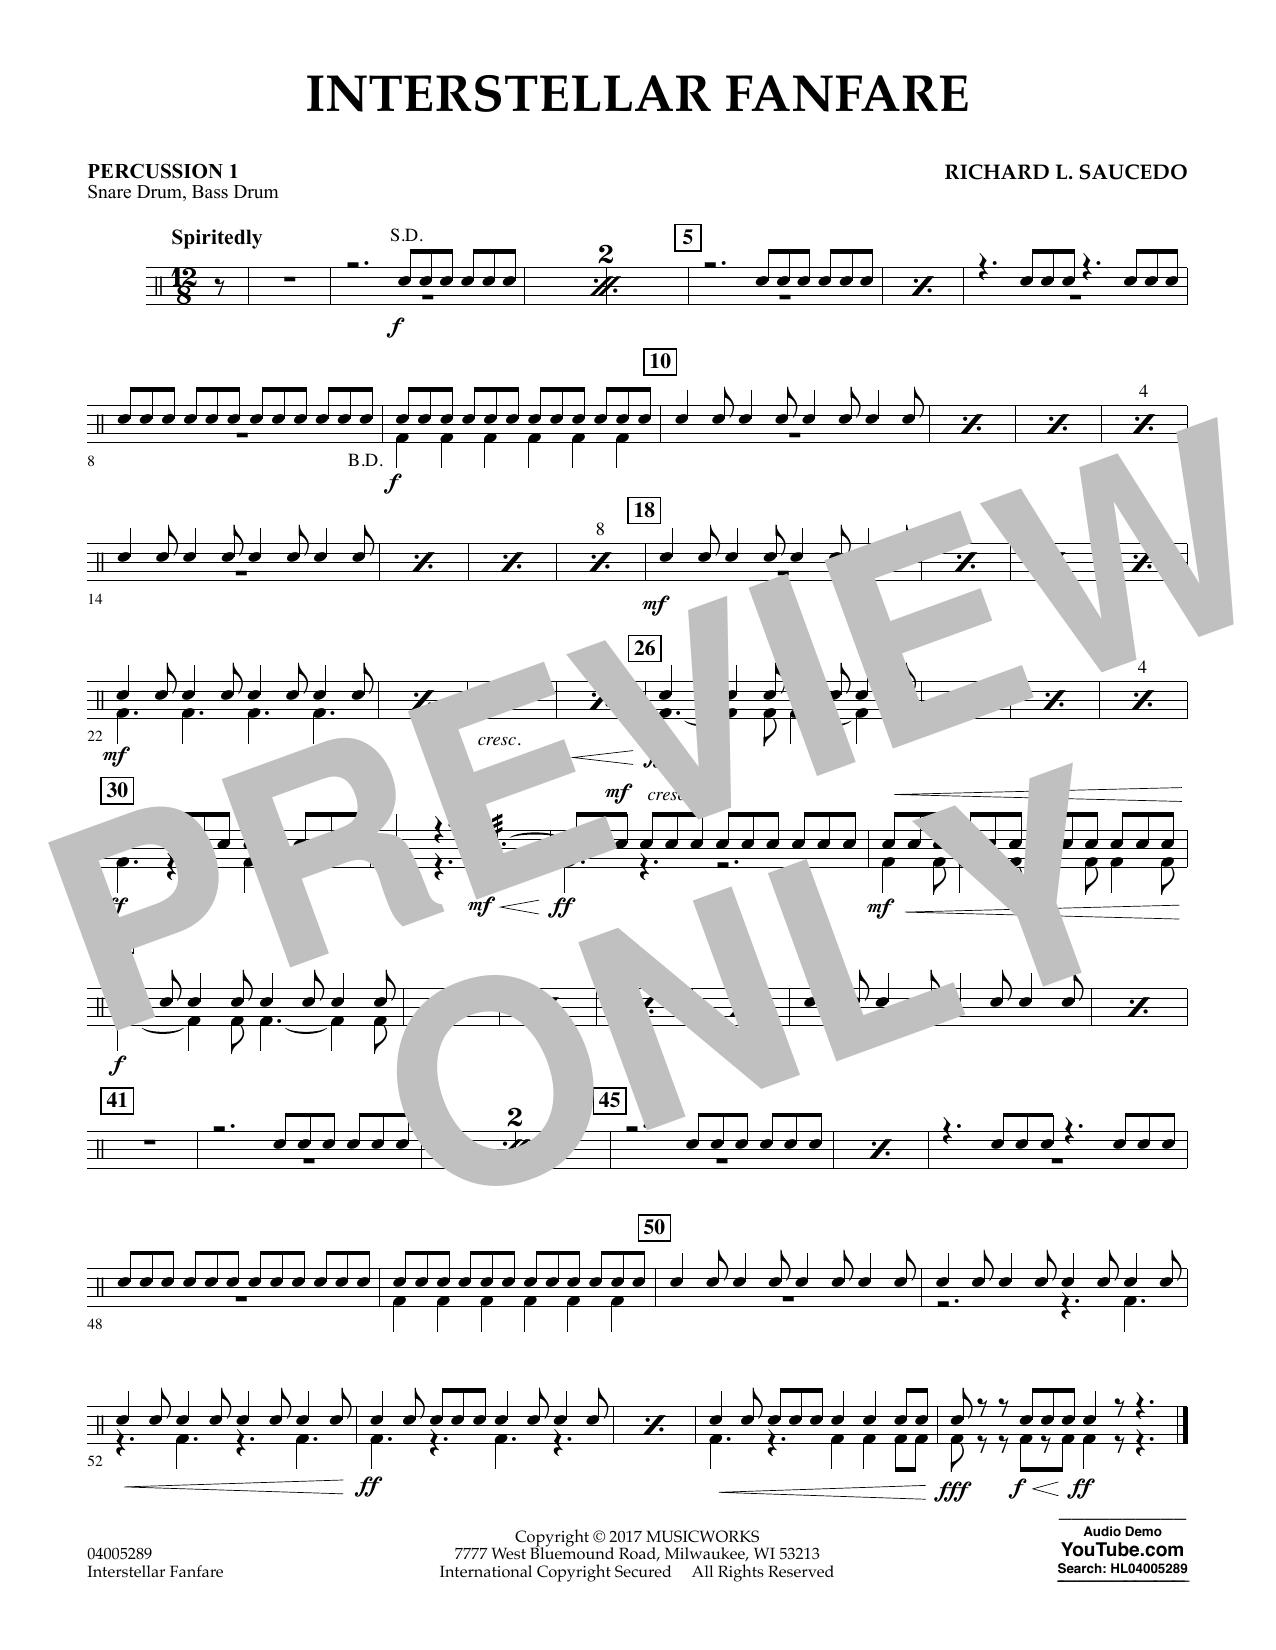 Richard L. Saucedo Interstellar Fanfare - Percussion 1 sheet music notes printable PDF score